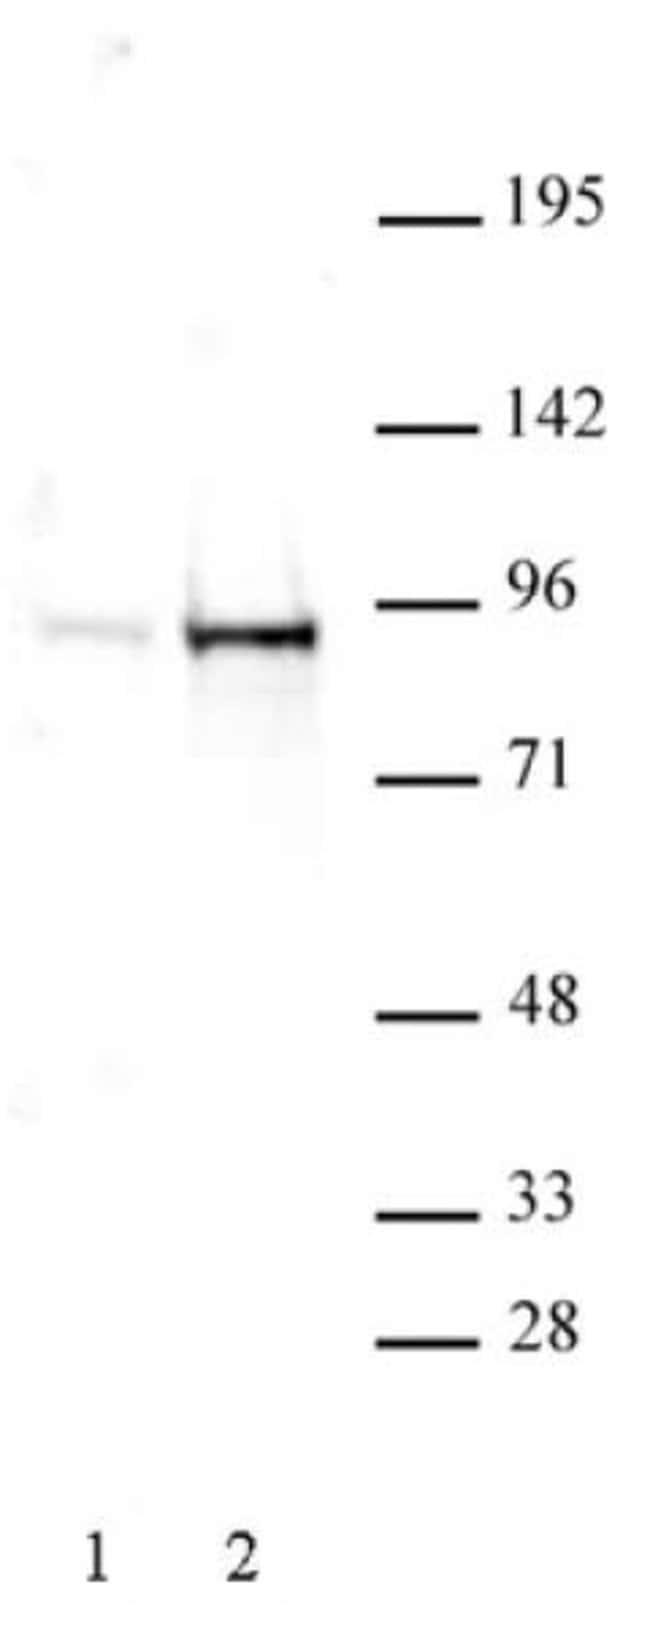 Phospho-STAT5A/B (Tyr694, Tyr699) Rabbit anti-Human, Unconjugated, Polyclonal,